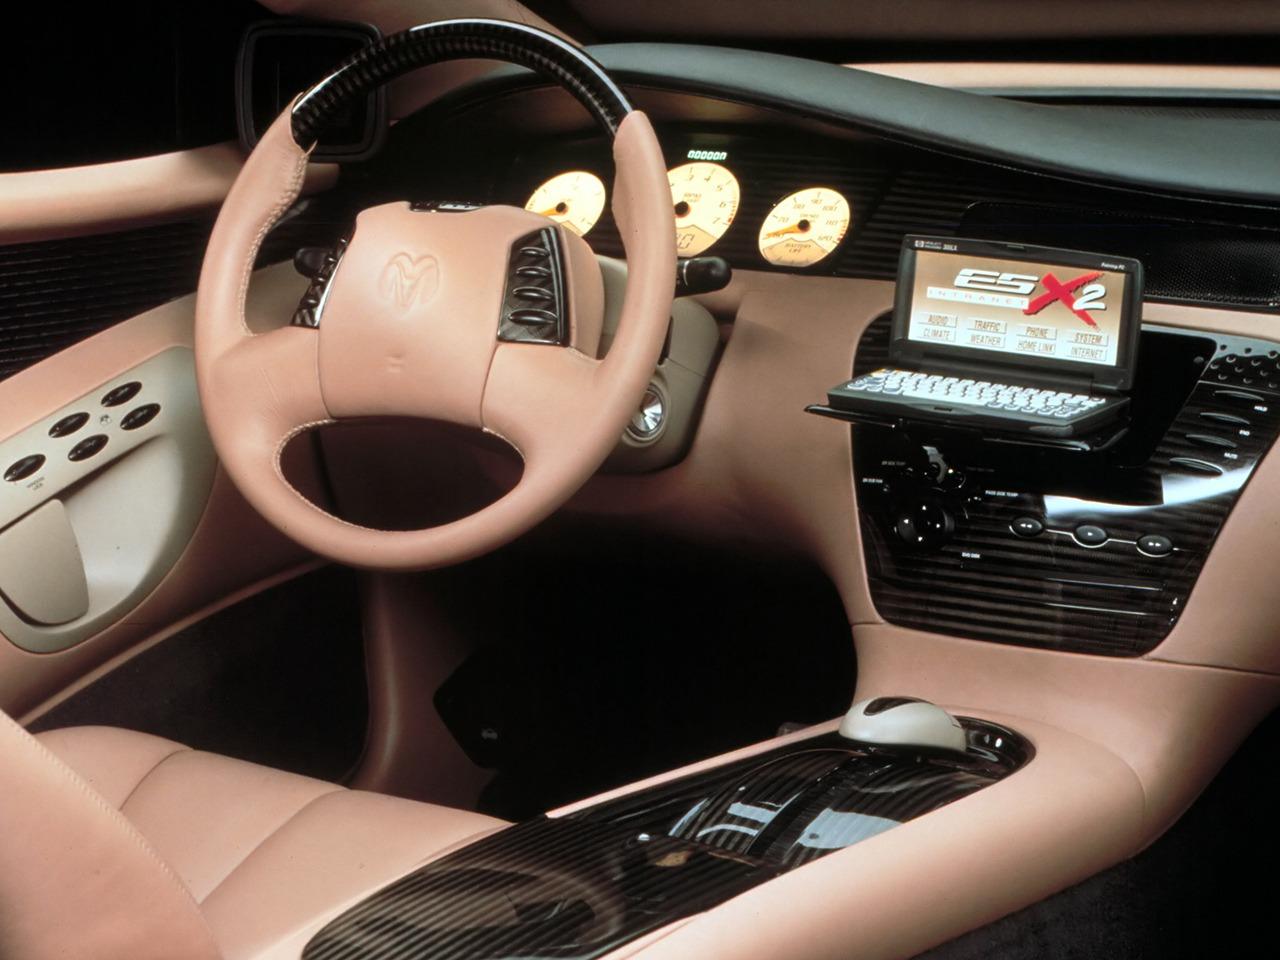 Dodge Intrepid ESX2 Concept (1998) - Old Concept Cars